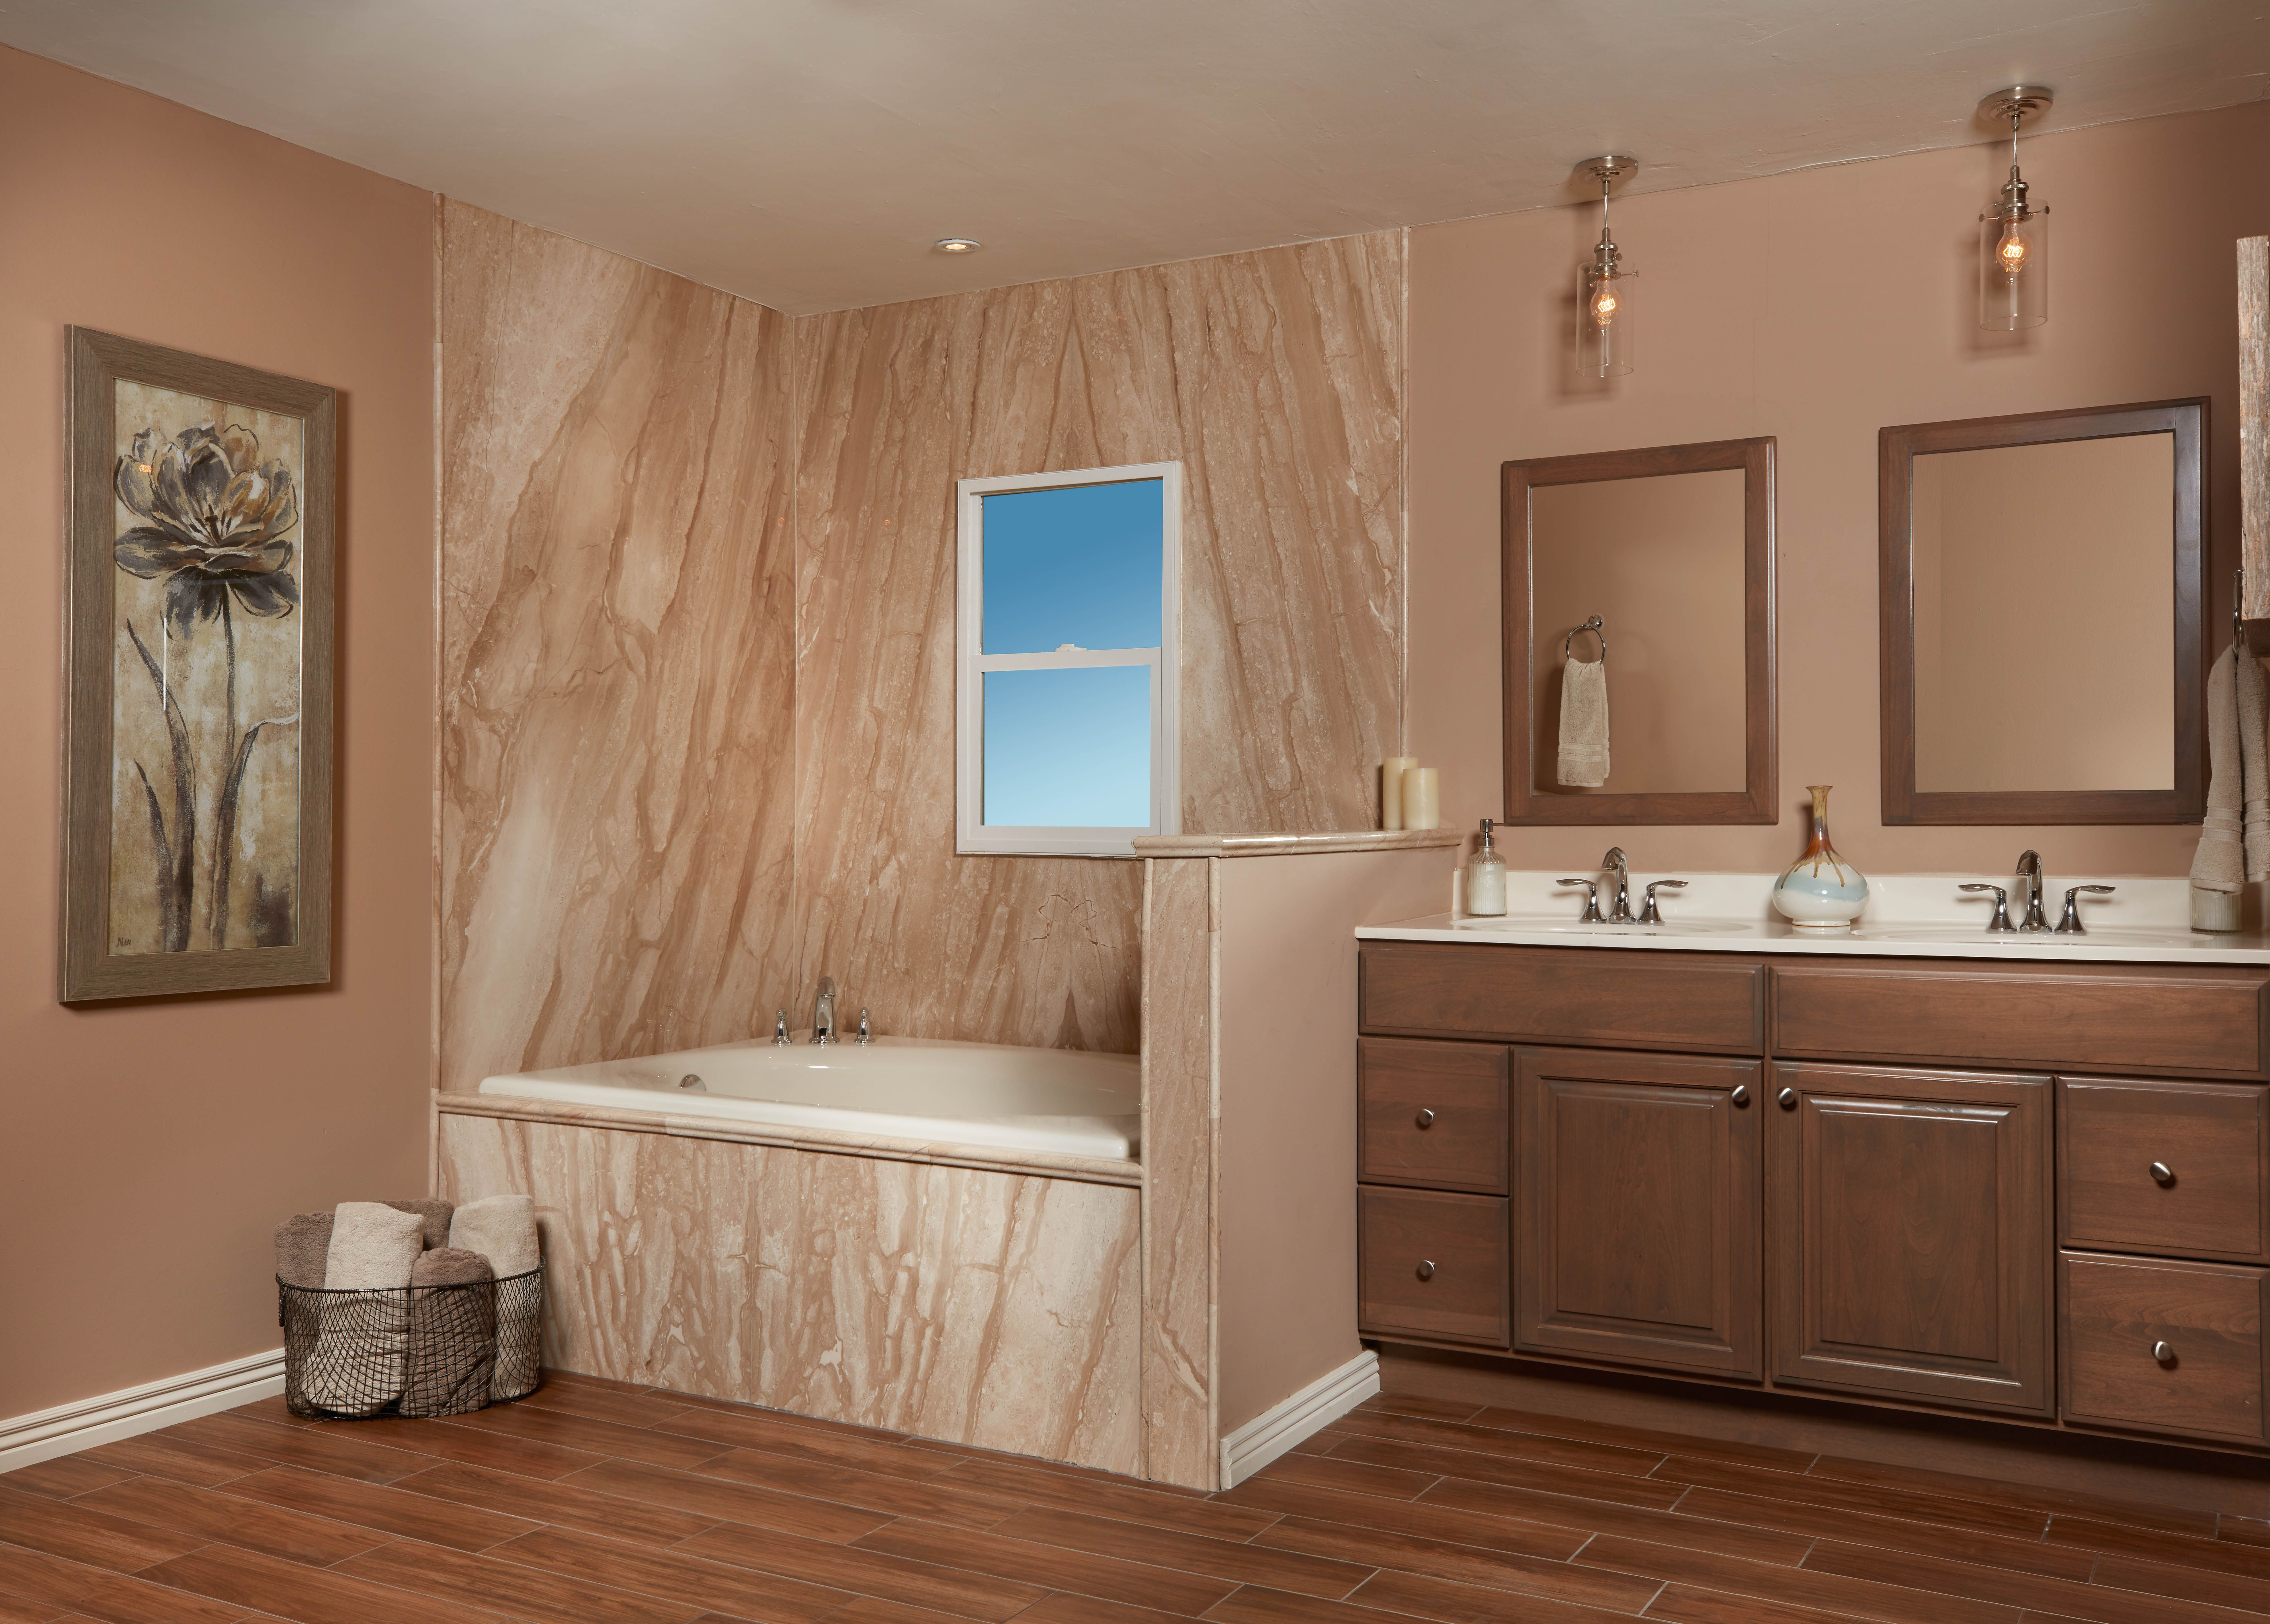 French Mocha Tub Surround Complete Bathroom Remodel Bathrooms Remodel Bathroom [ 5666 x 7918 Pixel ]